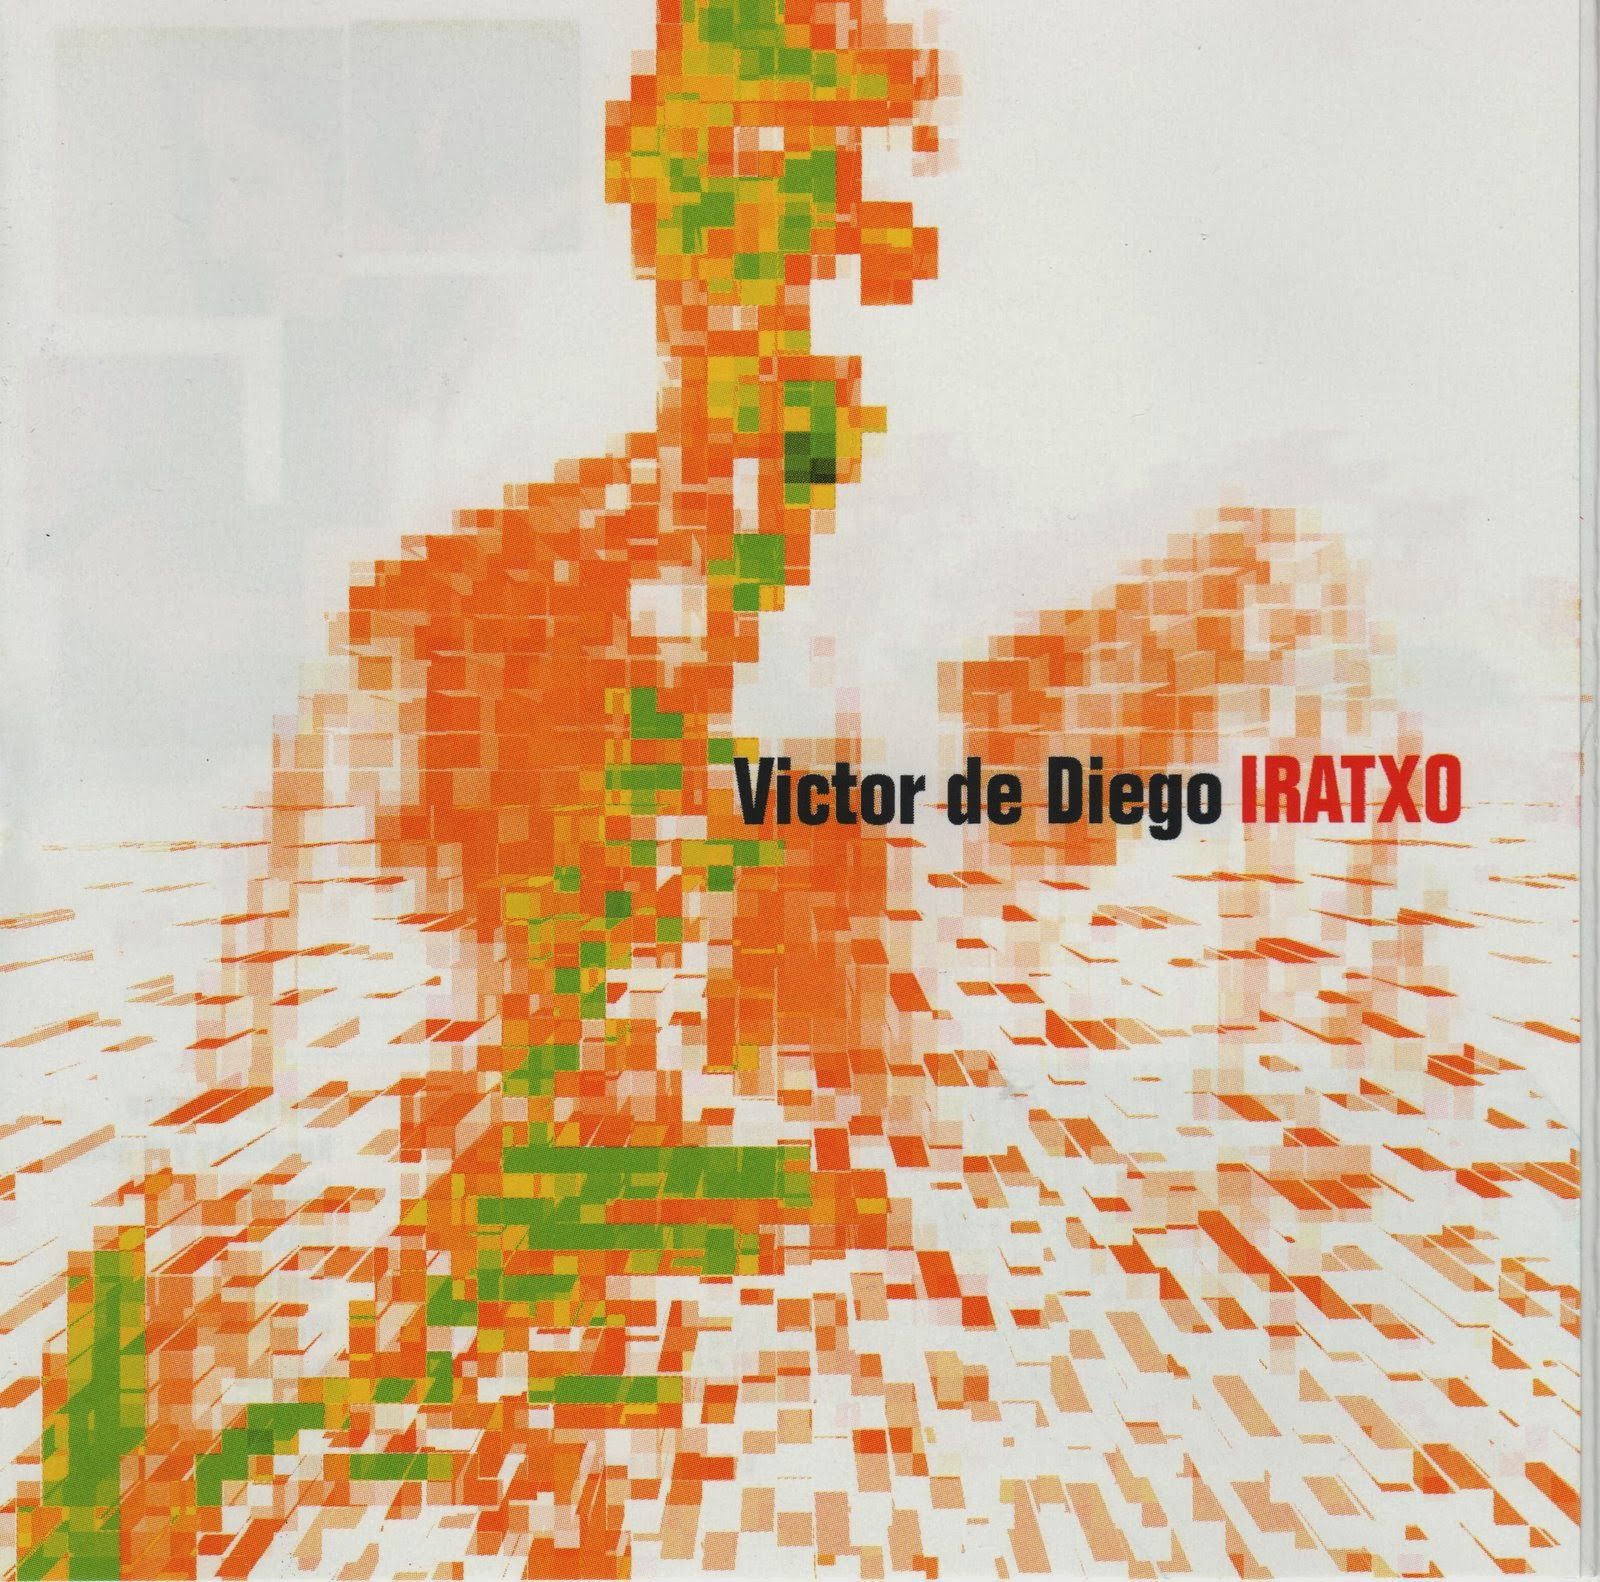 Víctor de Diego